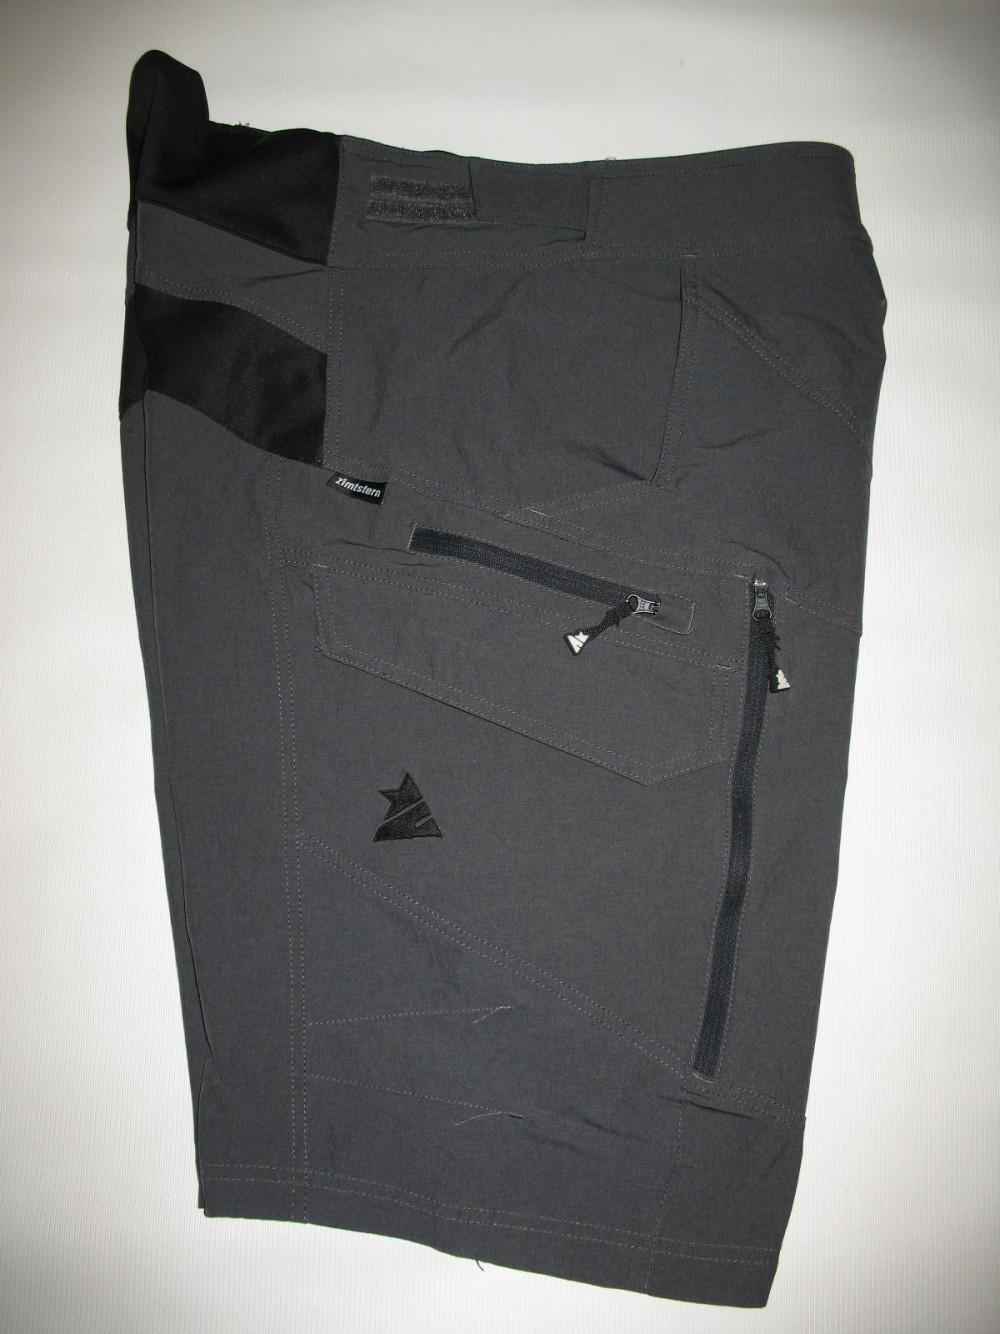 Велошорты ZIMTSTERN trailstar bike shorts (размер L) - 9